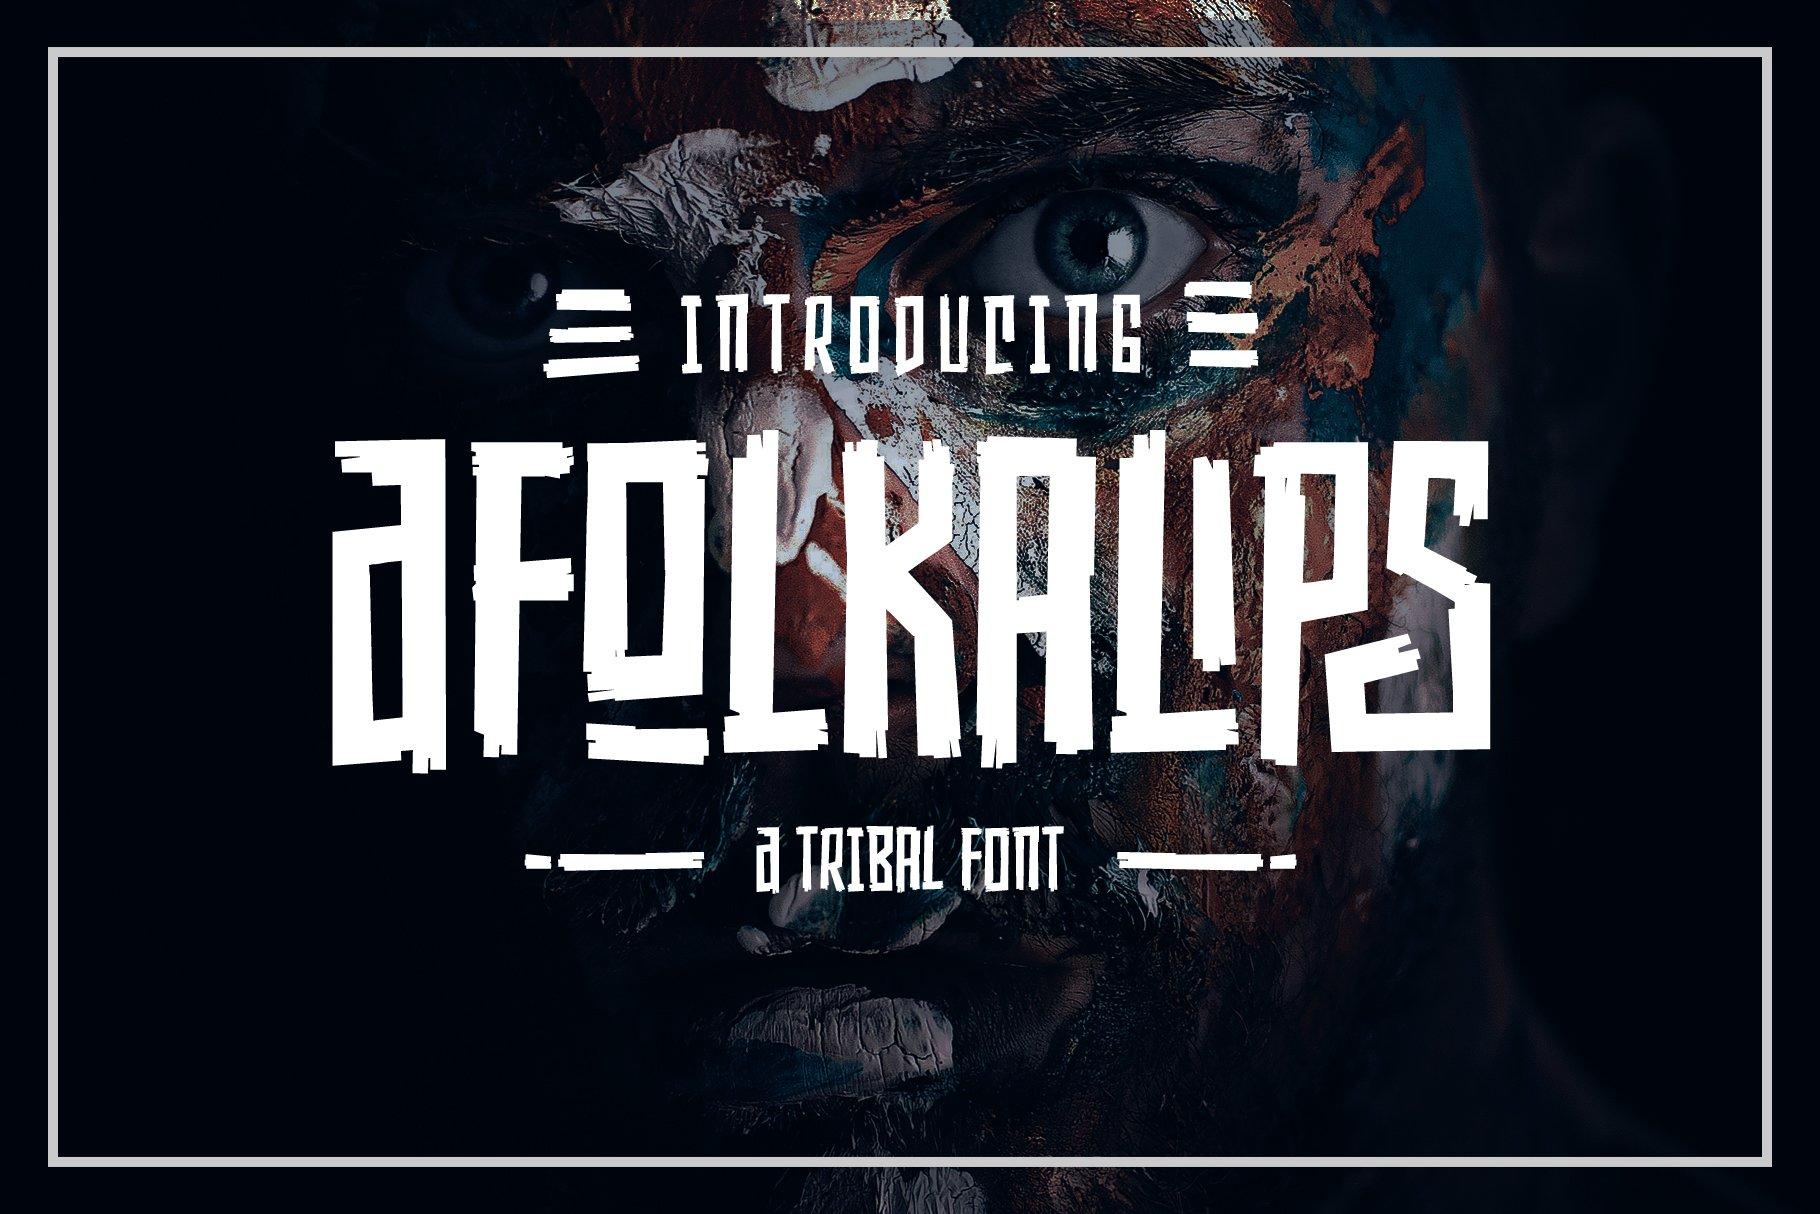 Afolkalips科幻创意游戏海报英文字体下载